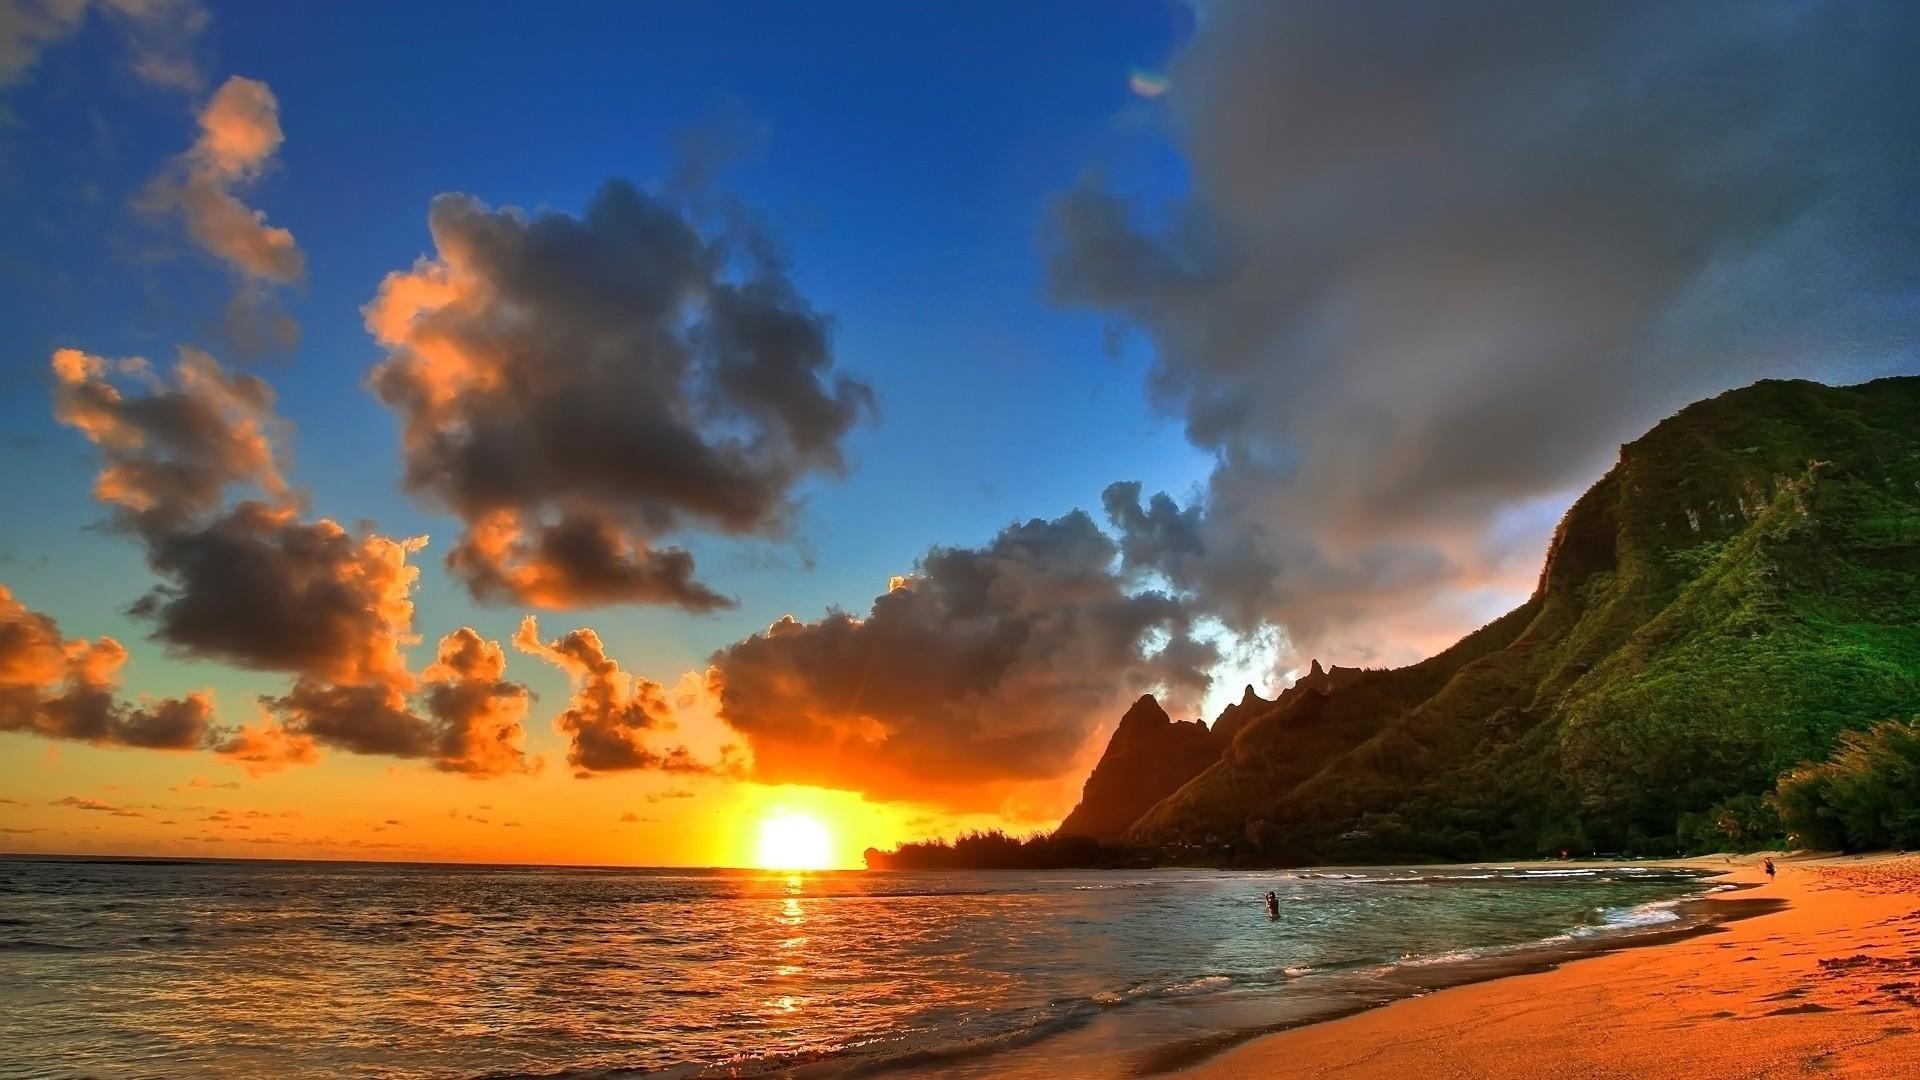 Res: 1920x1080, Beach Sunsethd Wallpaper For Desktop Summer Sunset 1080p Of Iphone Hd Pics